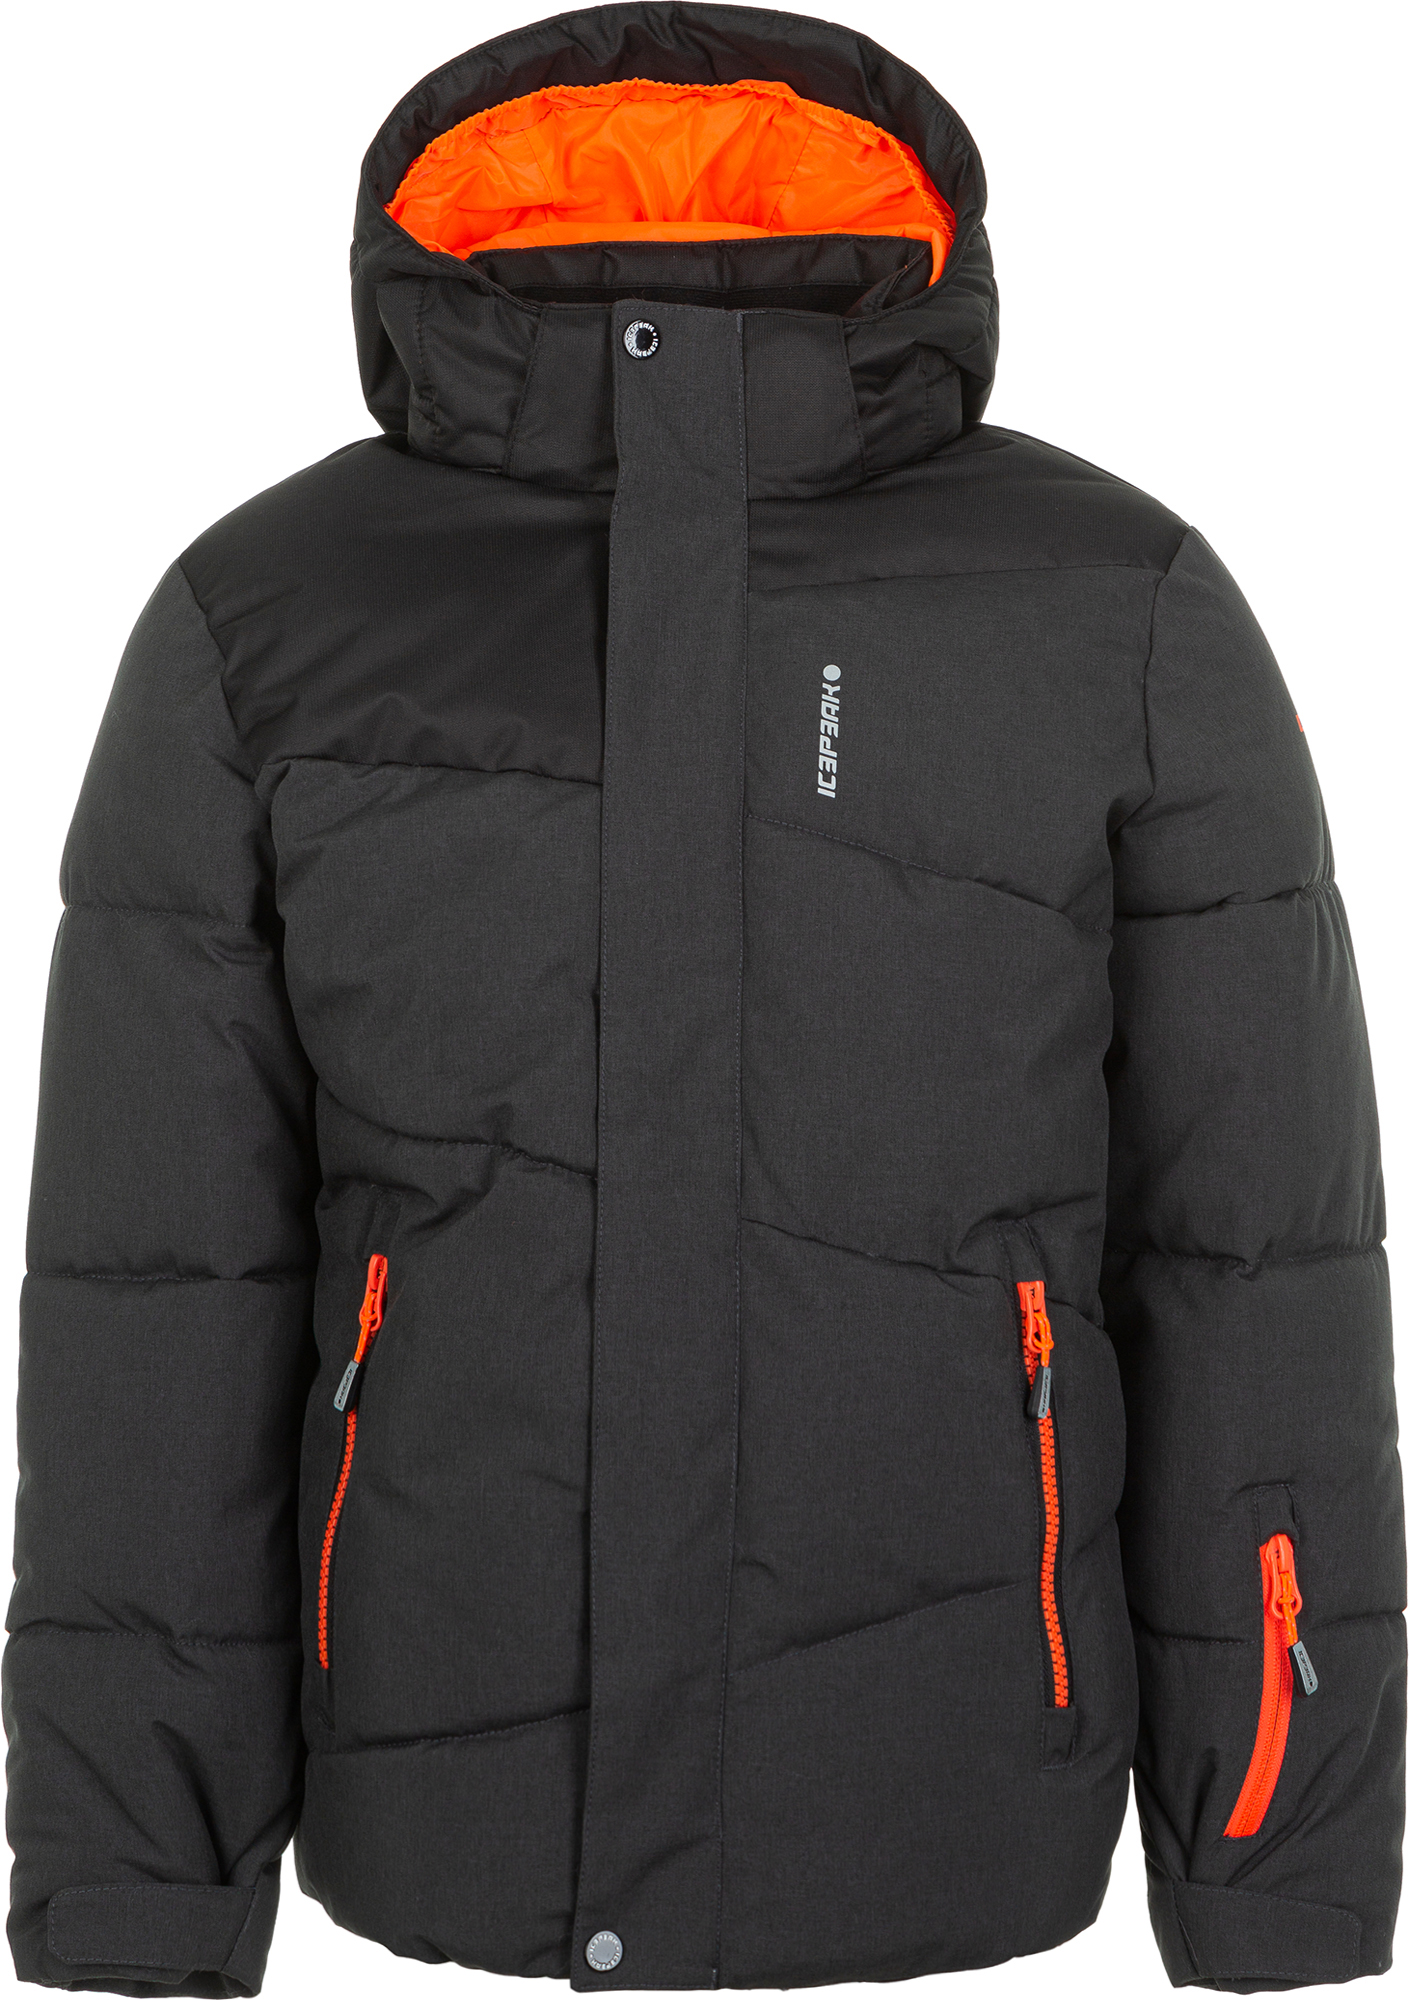 IcePeak Куртка утепленная для мальчиков IcePeak Linton JR, размер 152 цена 2017